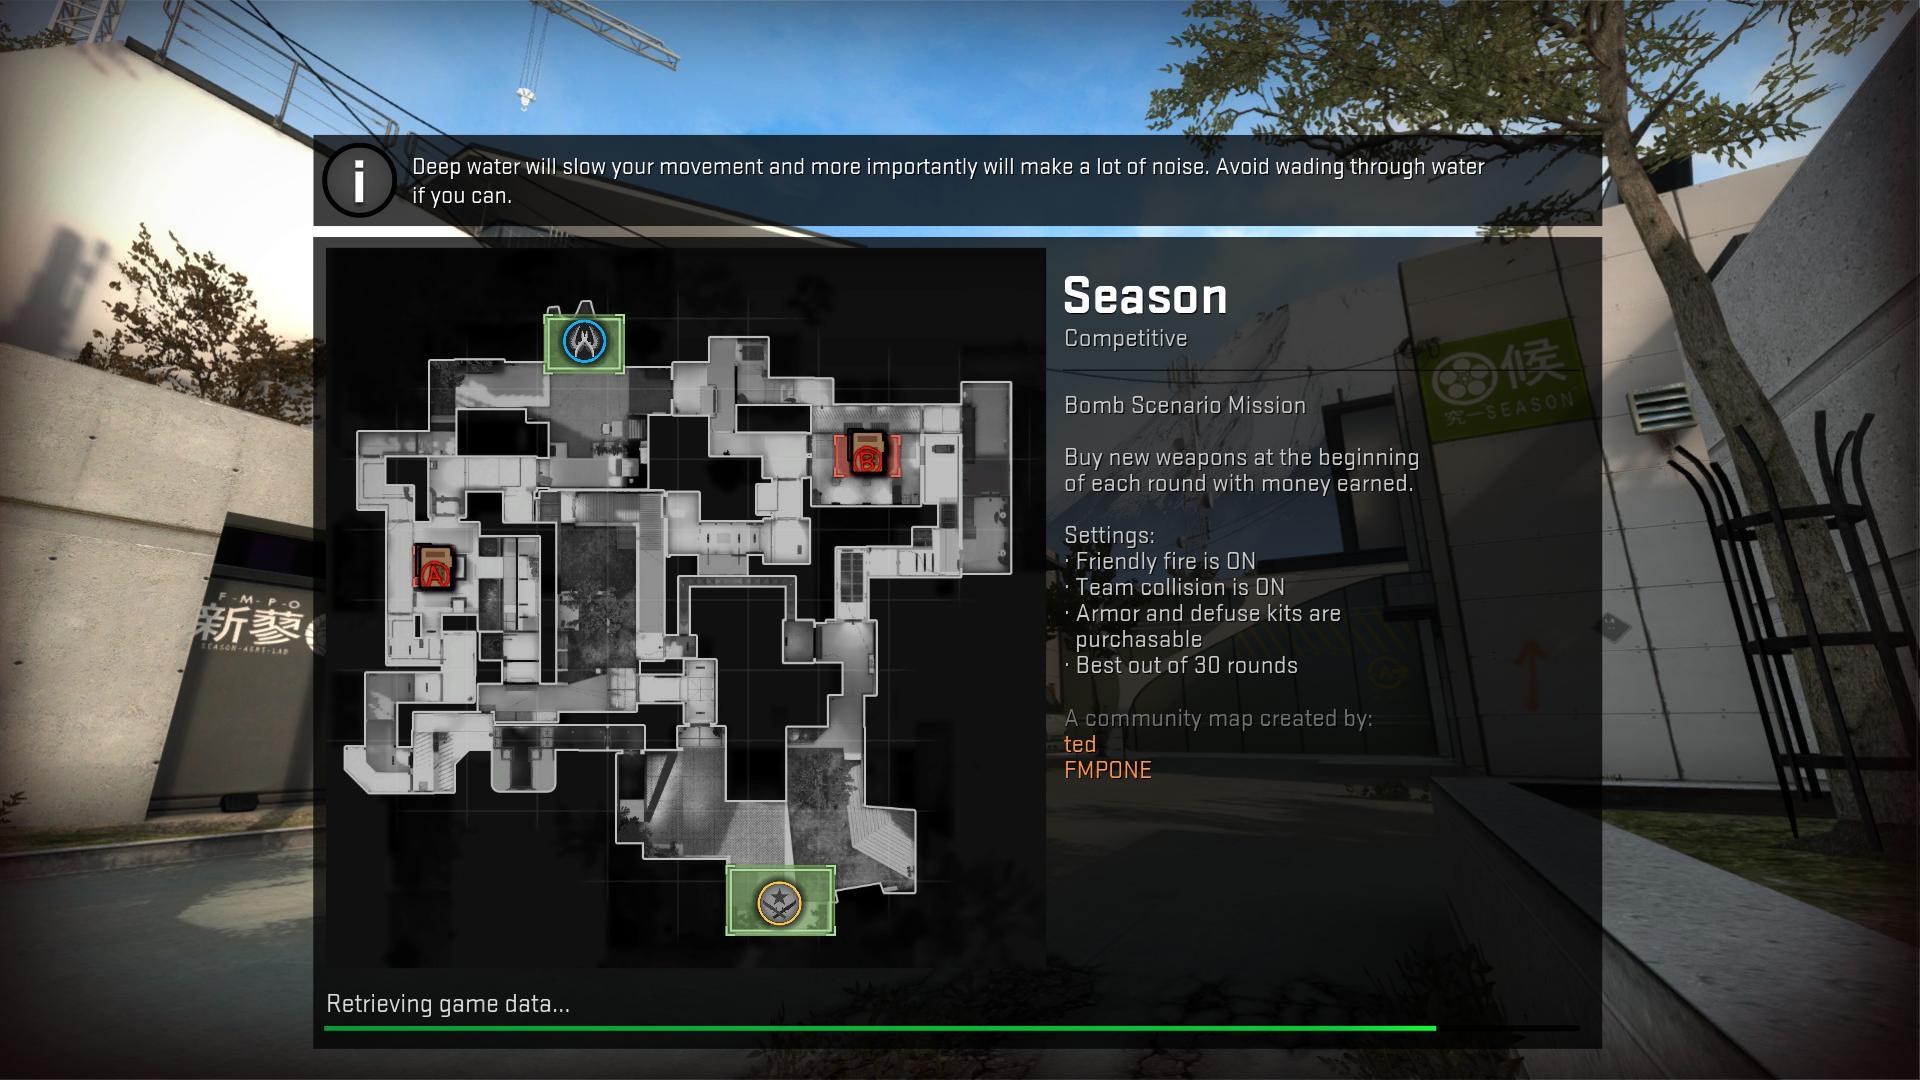 de_season csgo screenshot - Gamingcfg com